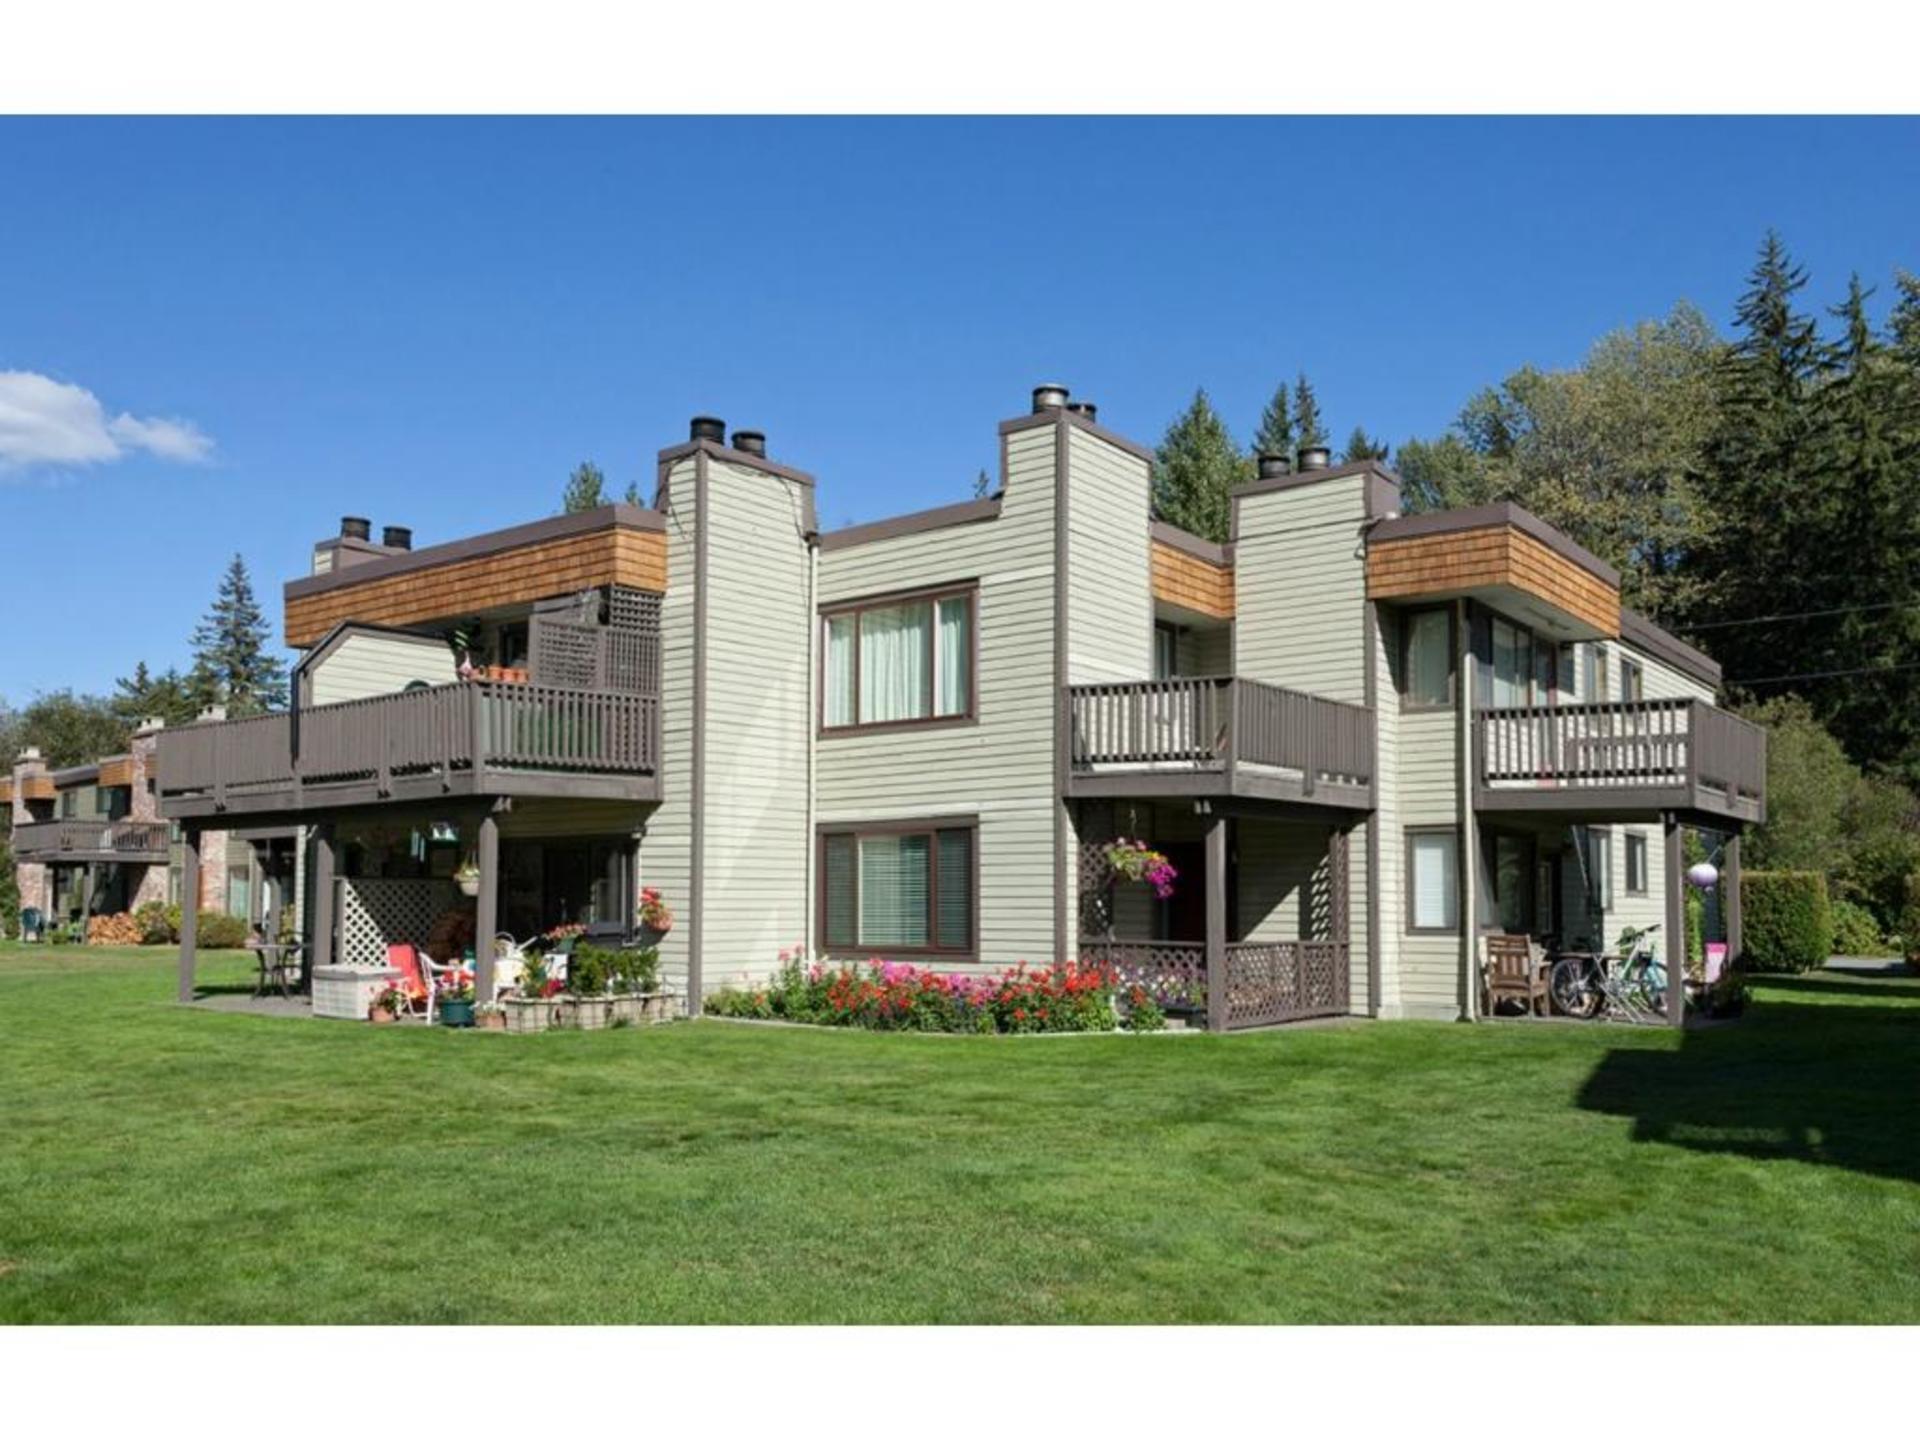 6850 Crabapple Drive, Whistler Cay Estates, Whistler